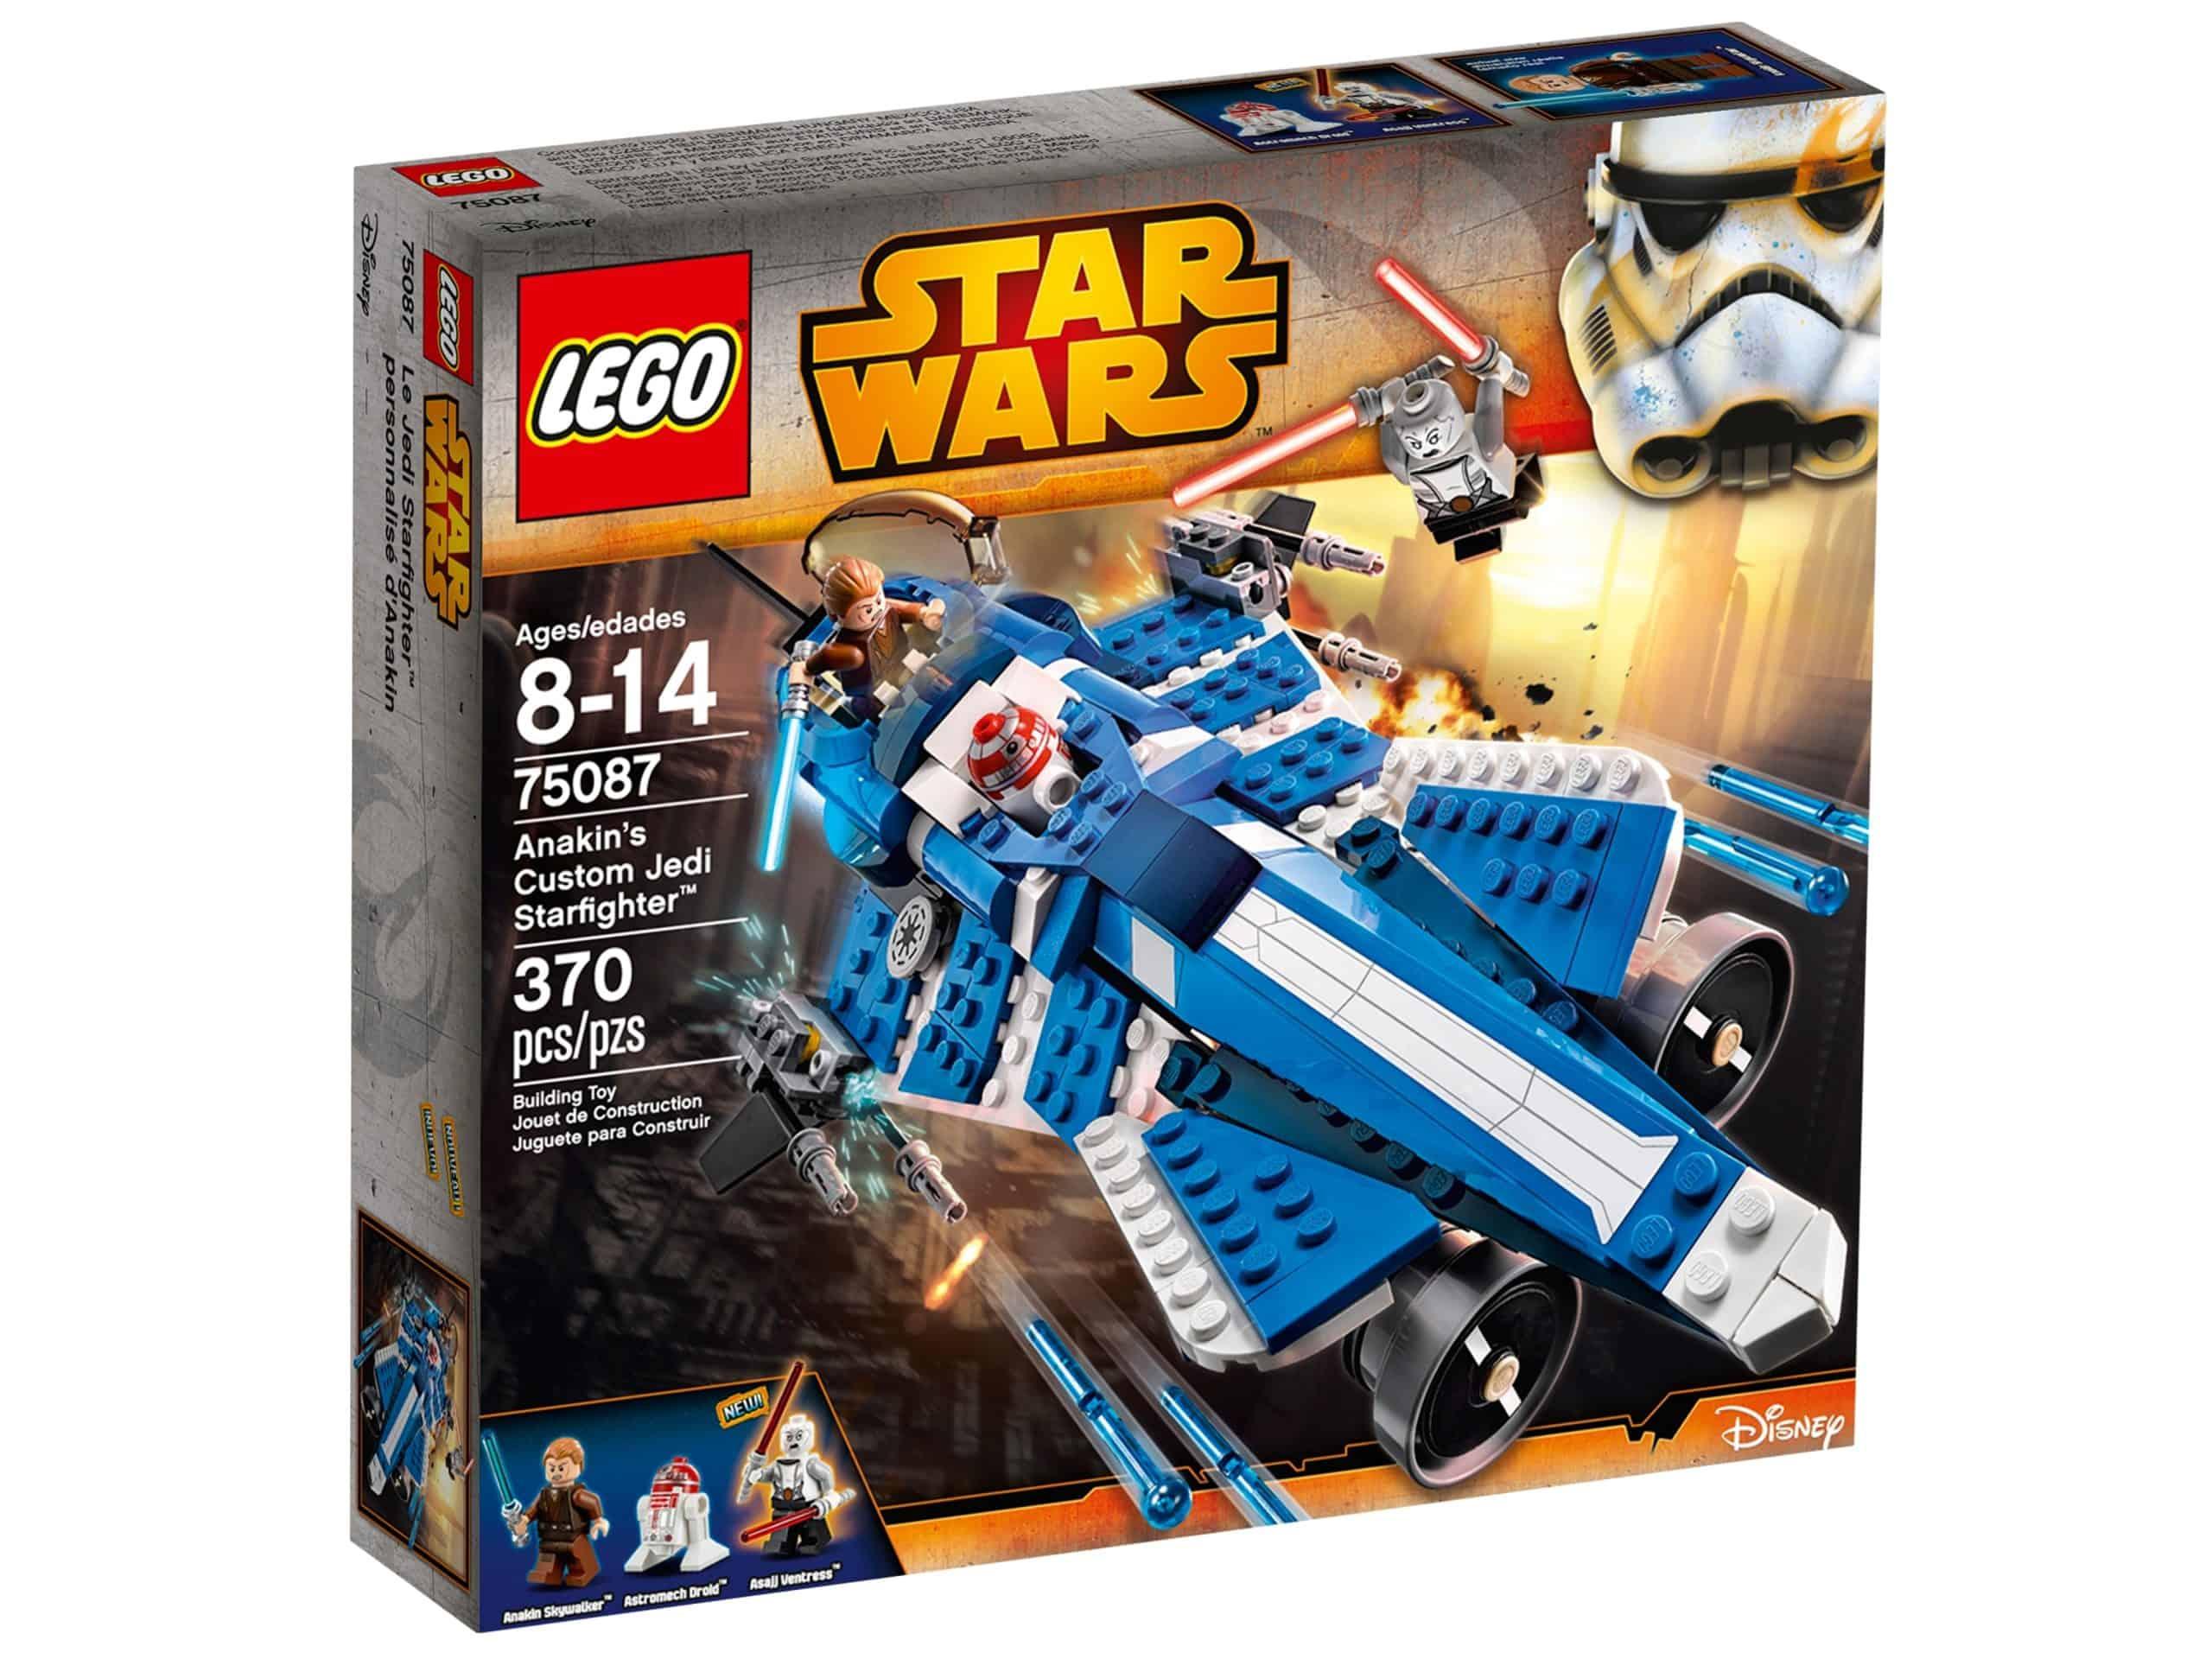 lego 75087 anakins specialbyggede jedi starfighter scaled